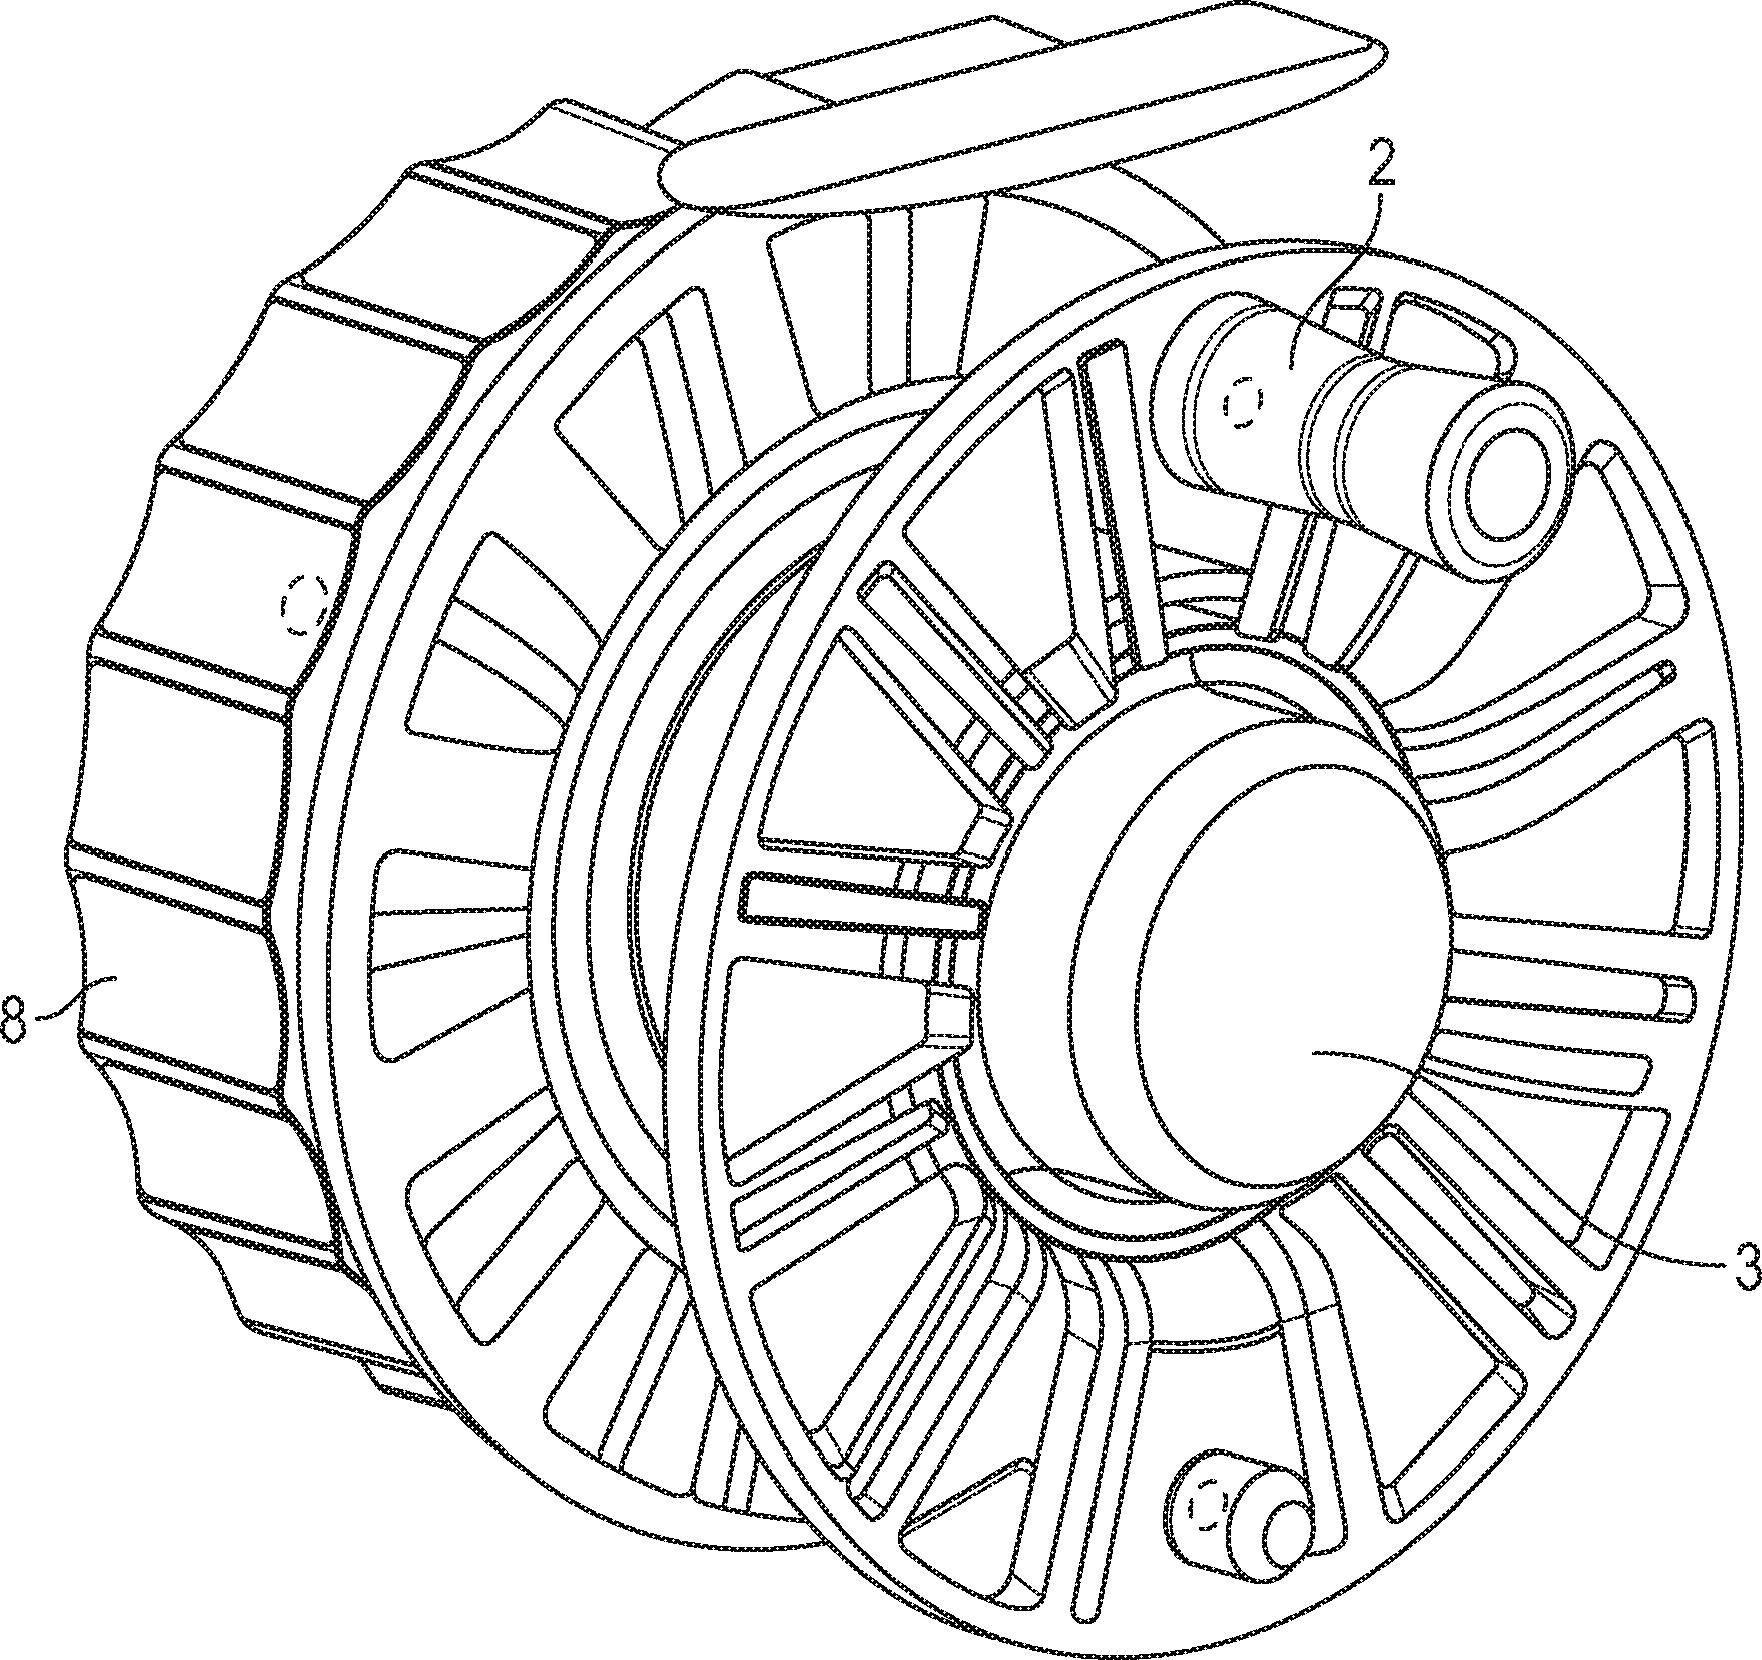 Figure GB2557959A_D0005